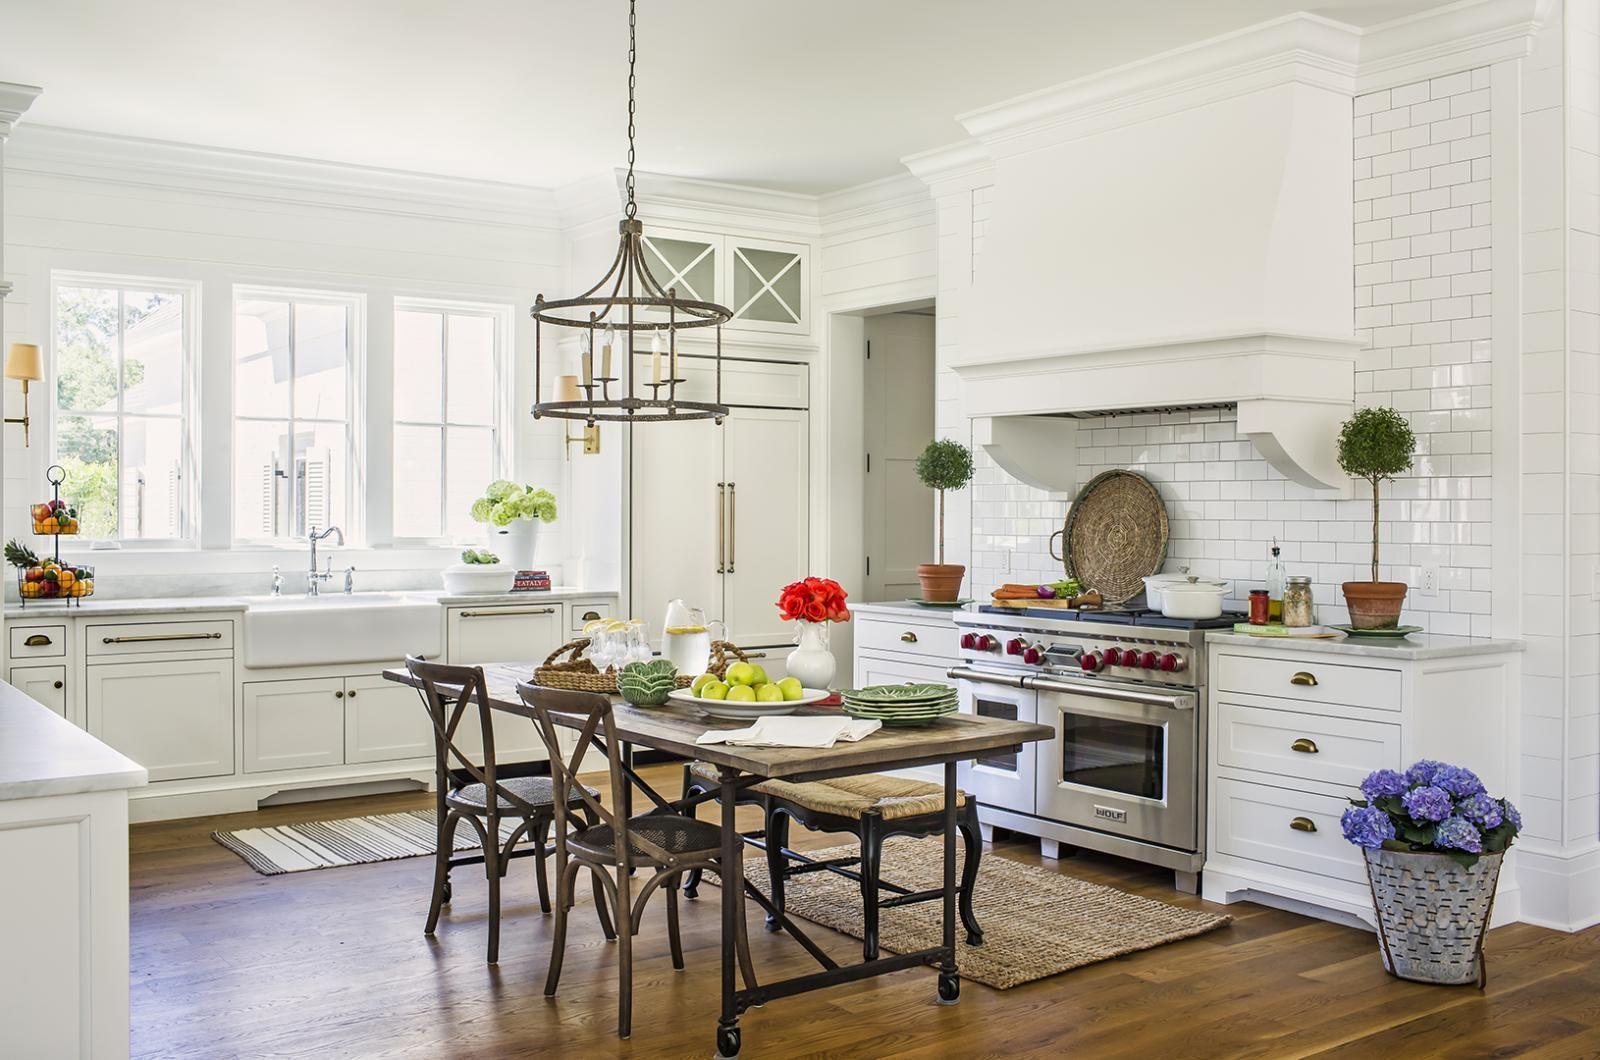 white kitchen with center table c brandon ingram ...